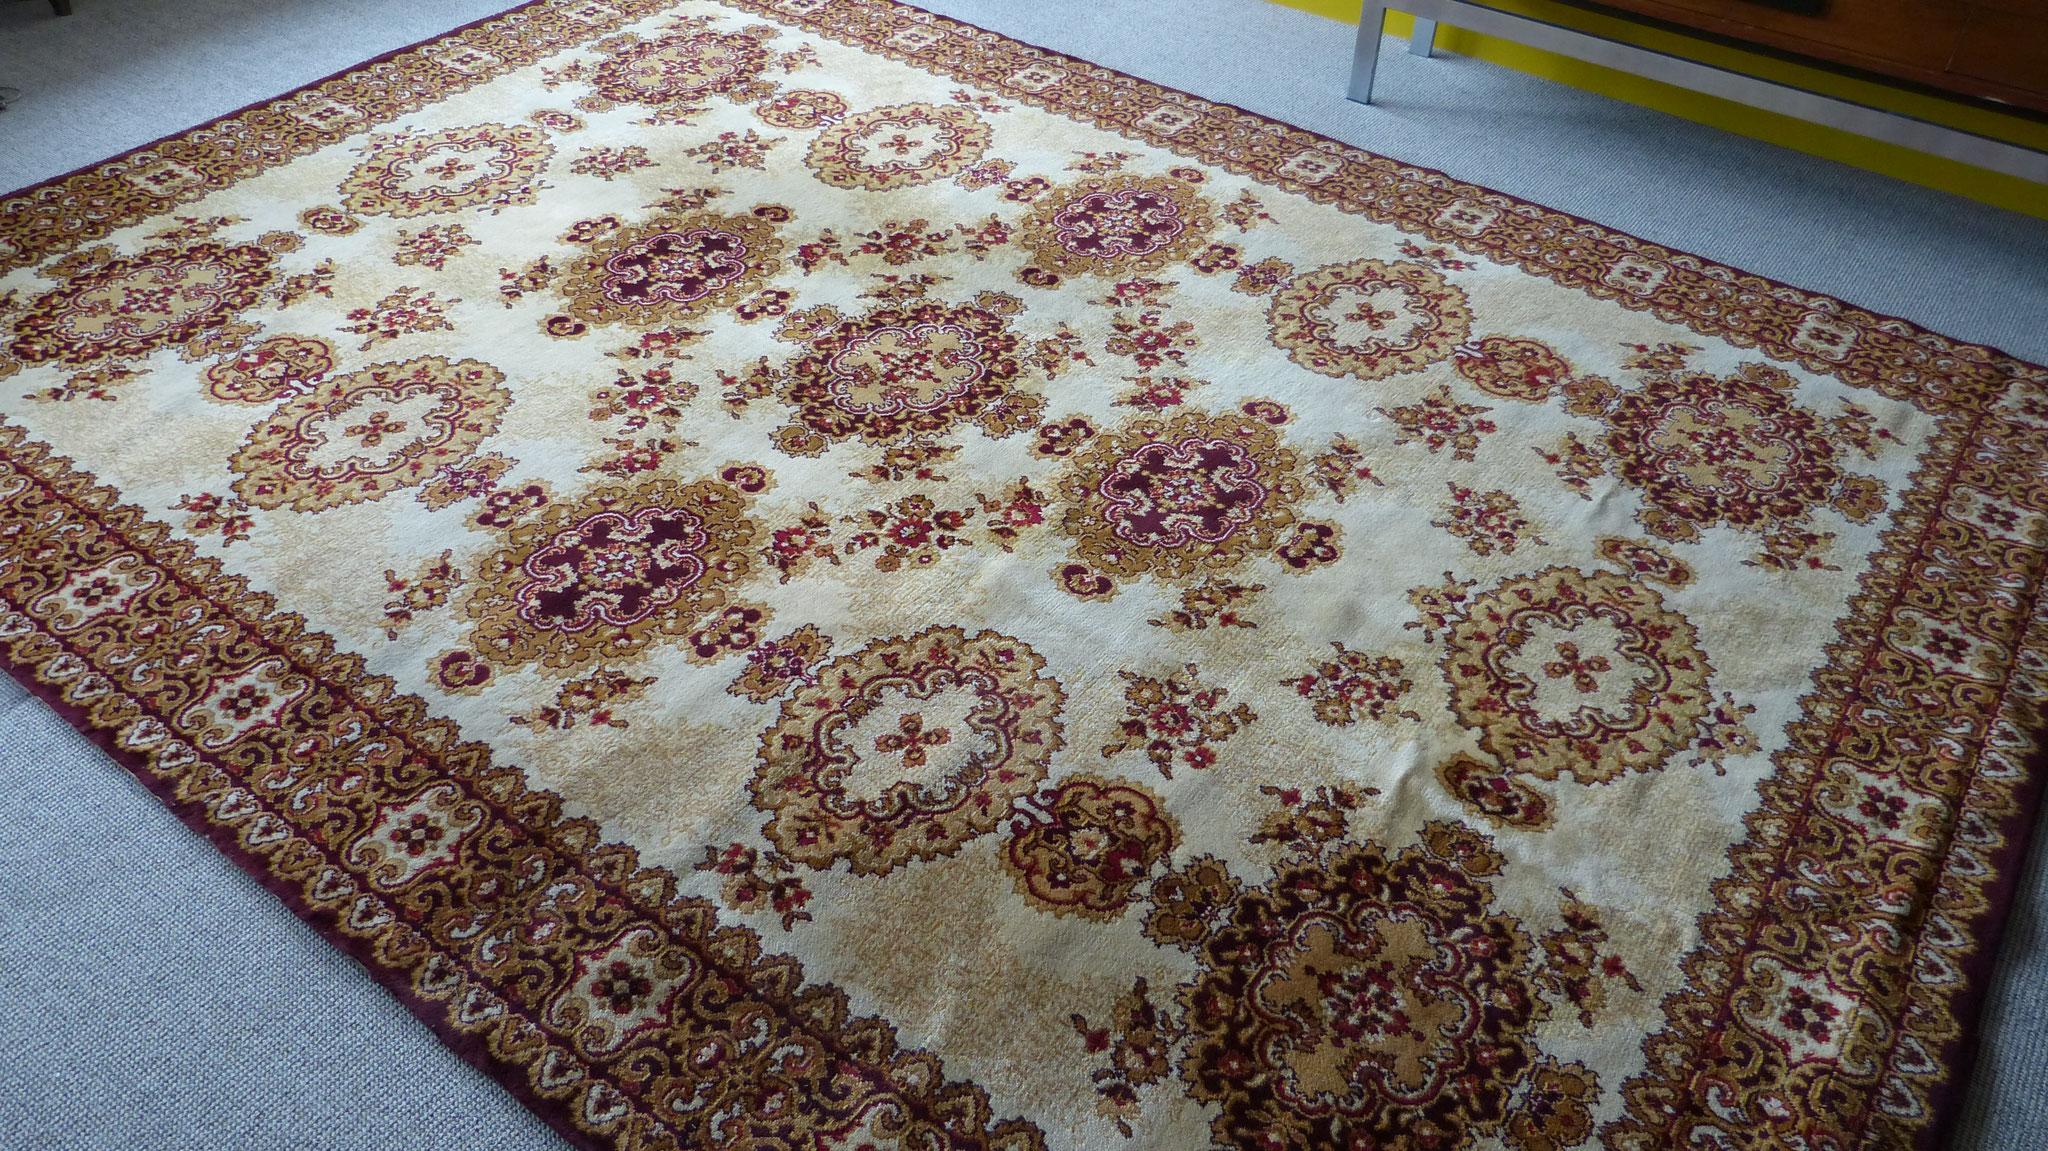 Oosters tapijt 3.40 x 2.50 m.